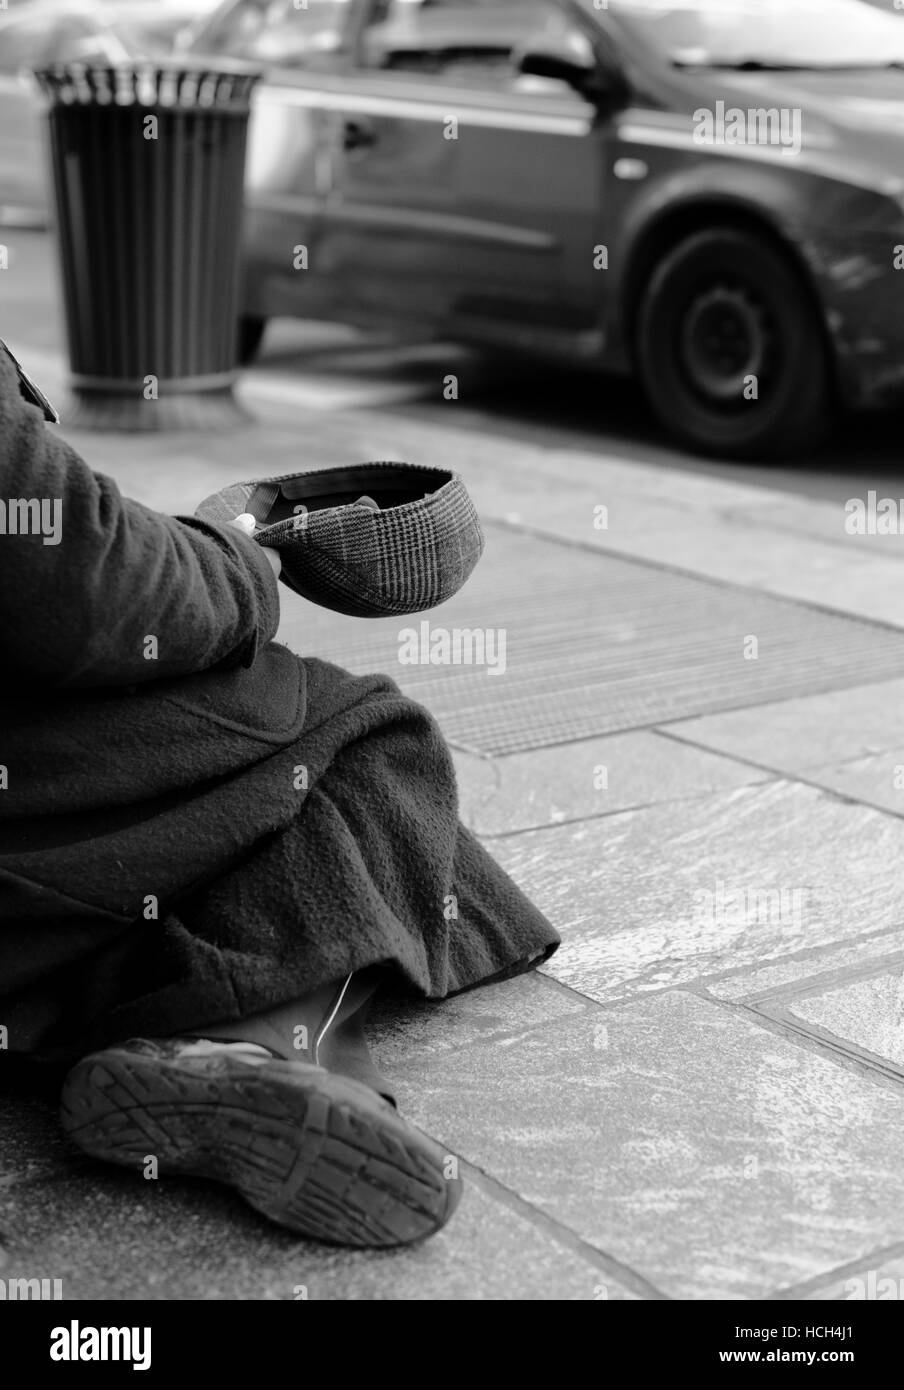 Poverty - Stock Image